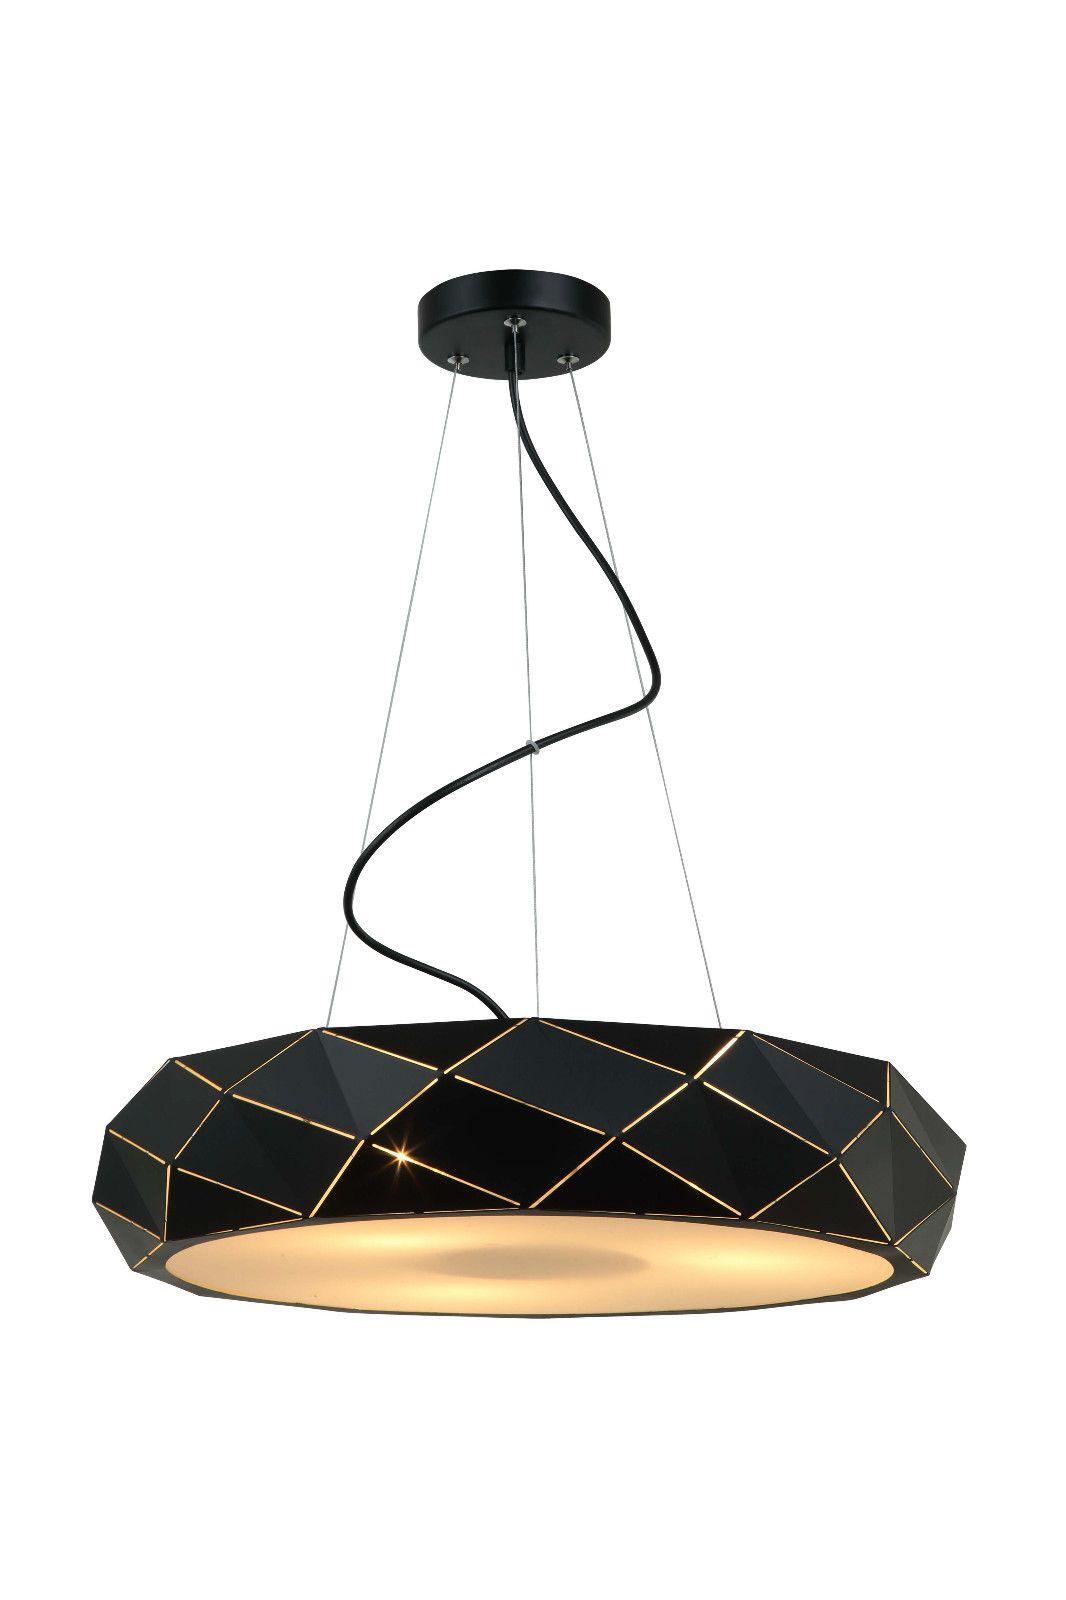 indoorlighting & interiorinspiration